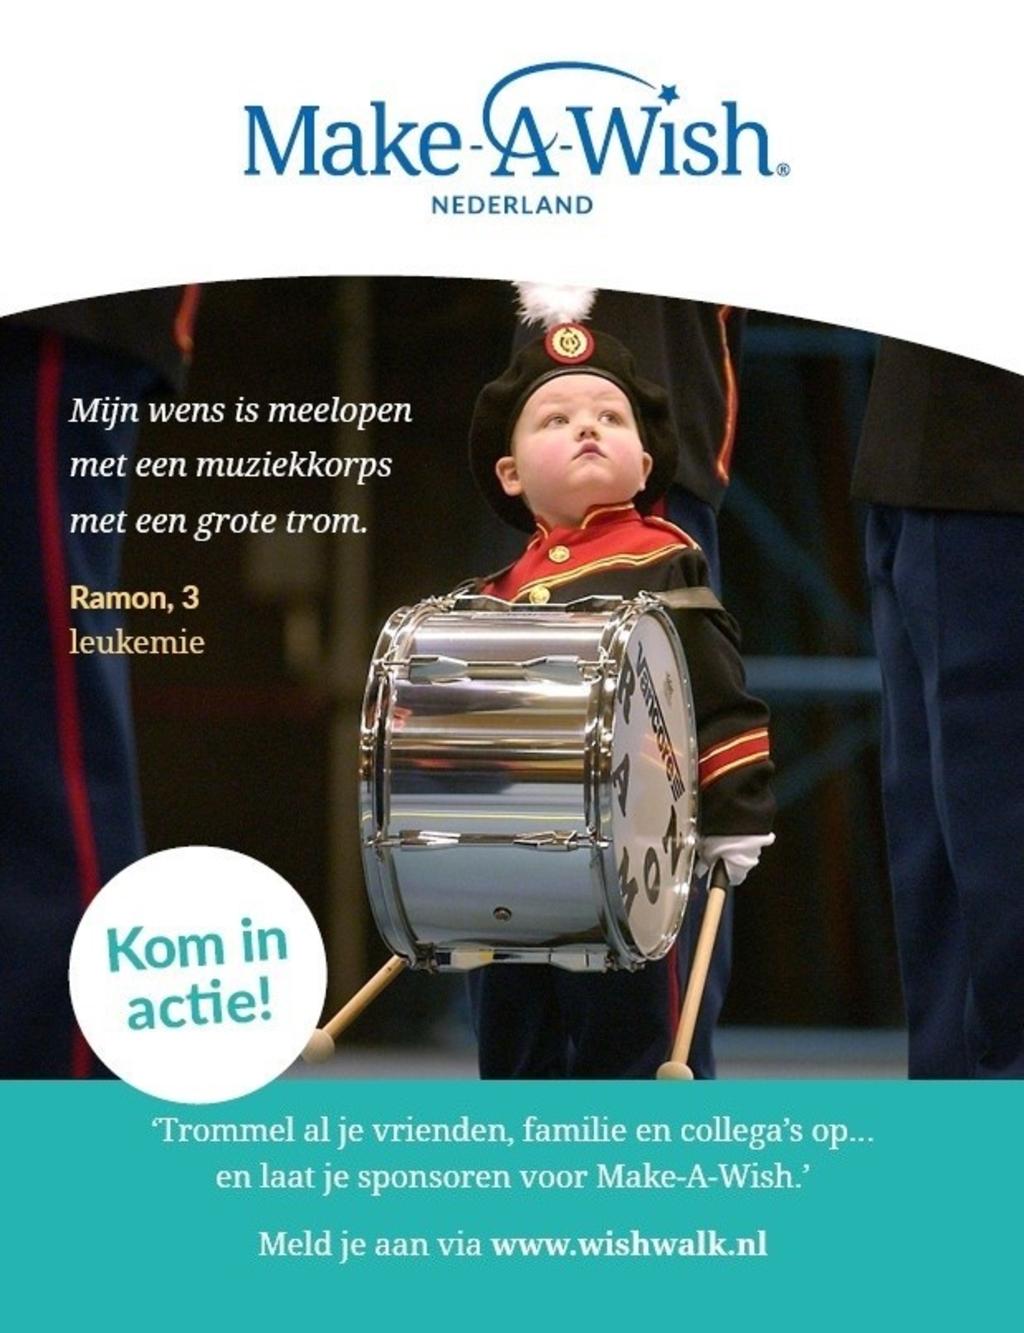 Foto: Make-A-Wish Nederland © DPG Media